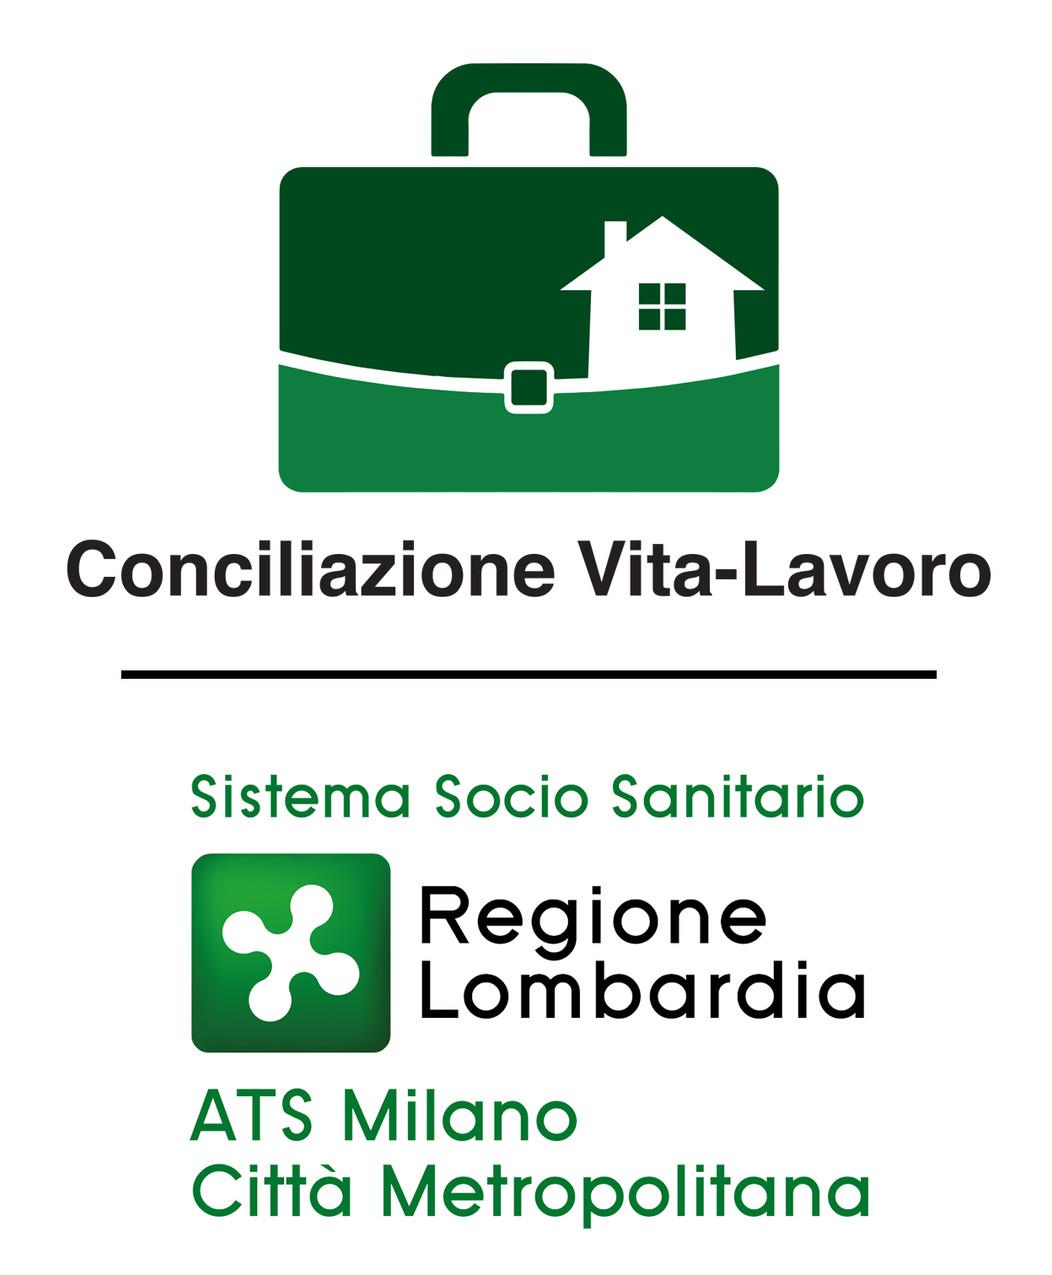 Conciliazione vert (Alta Def)